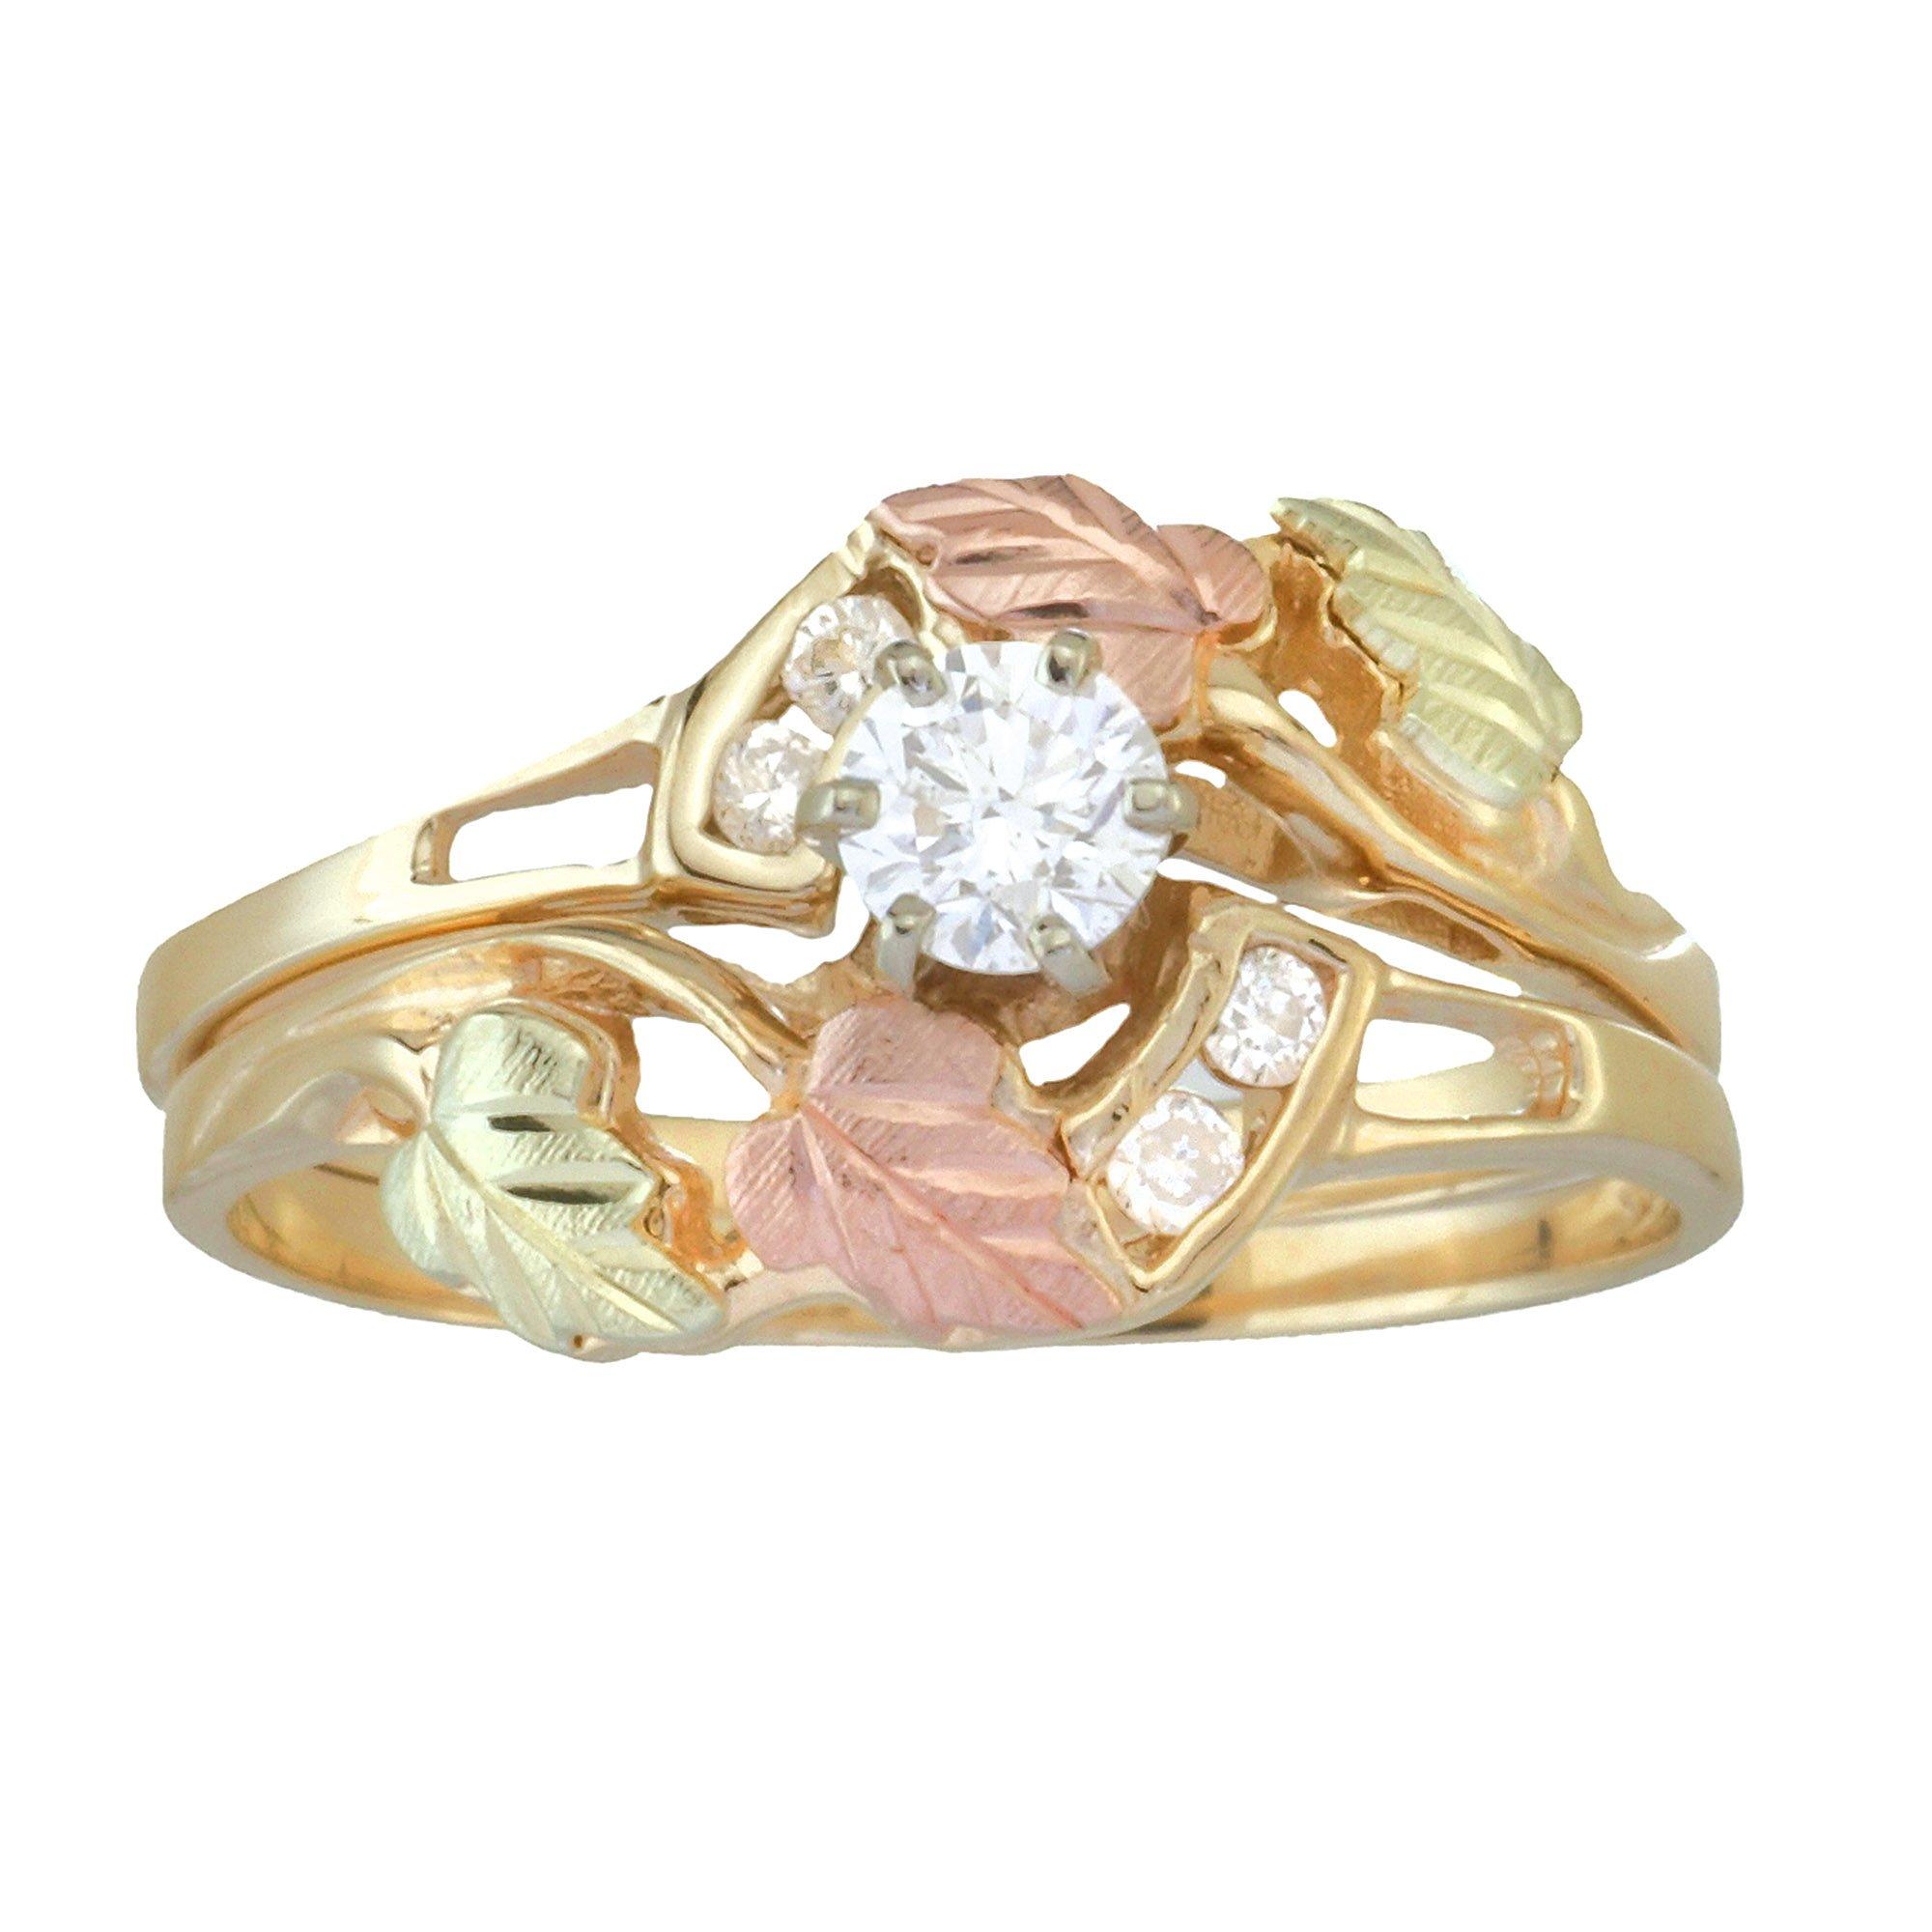 Five Diamond Gold Ring Black Hills Gold Black Hills Gold Rings Black Hills Gold Jewelry Black Hills Gold Wedding Rings